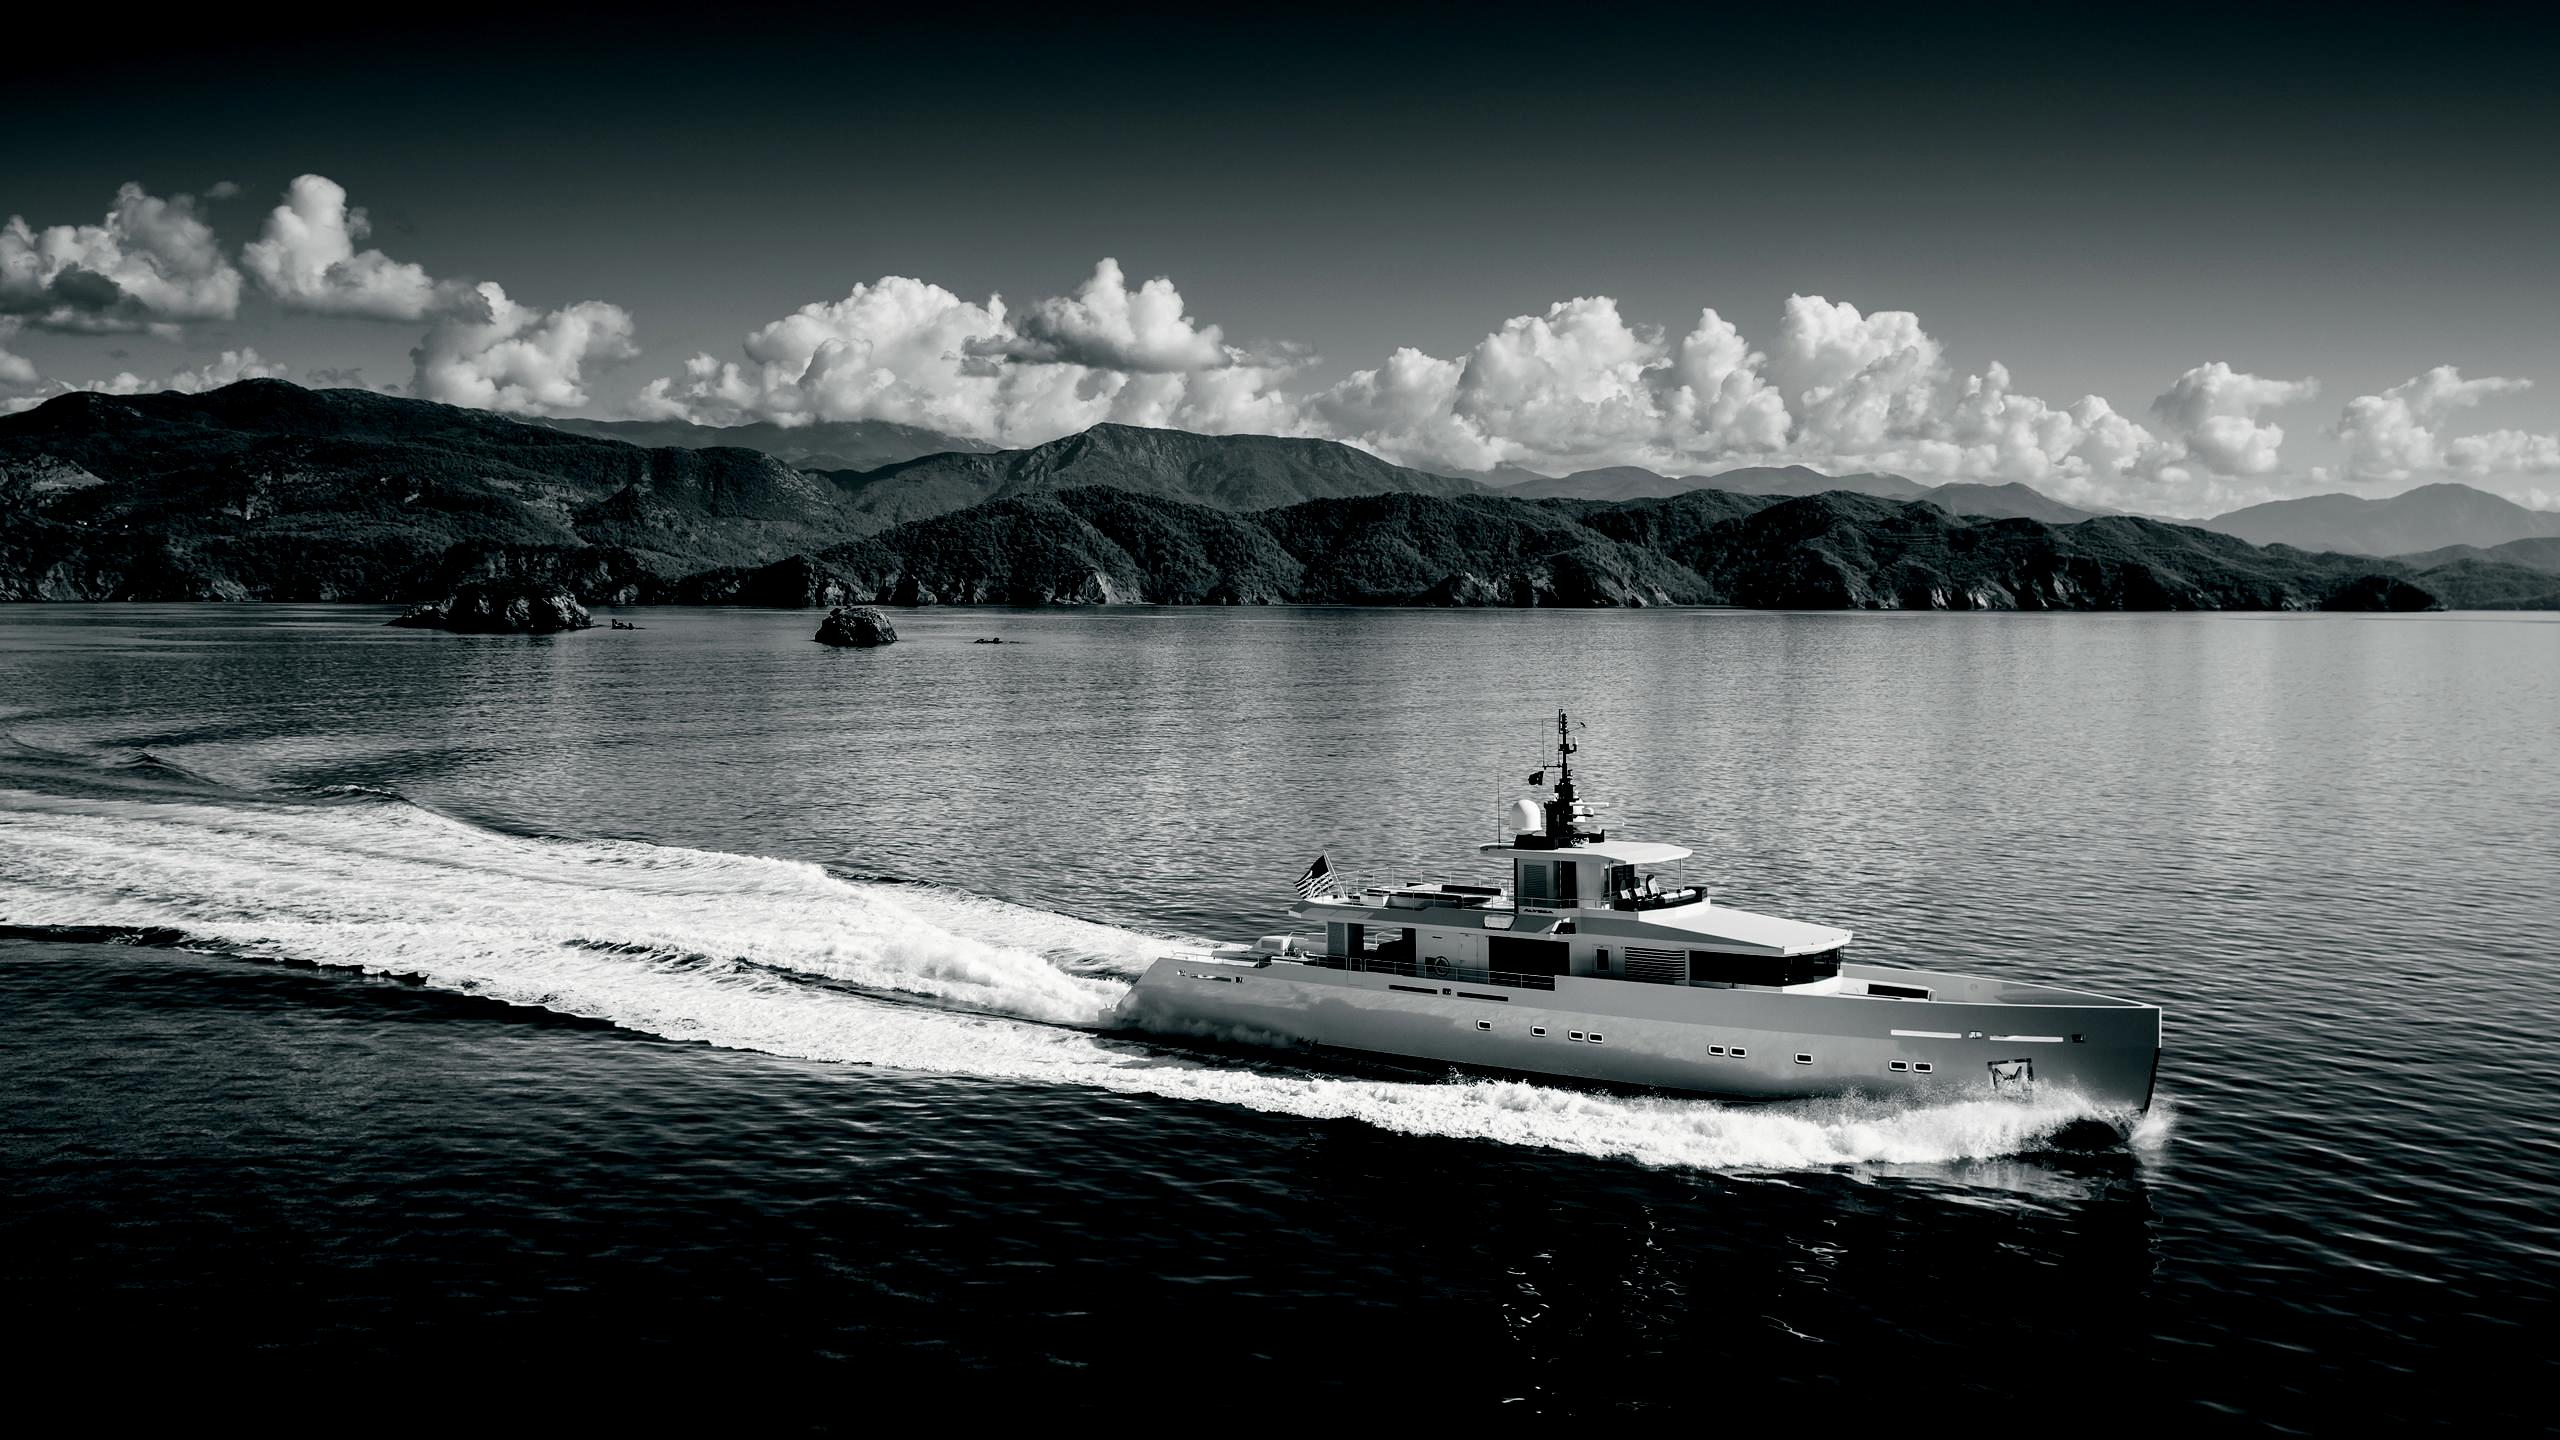 alyssa-motor-yacht-tansu-2014-39m-cruising